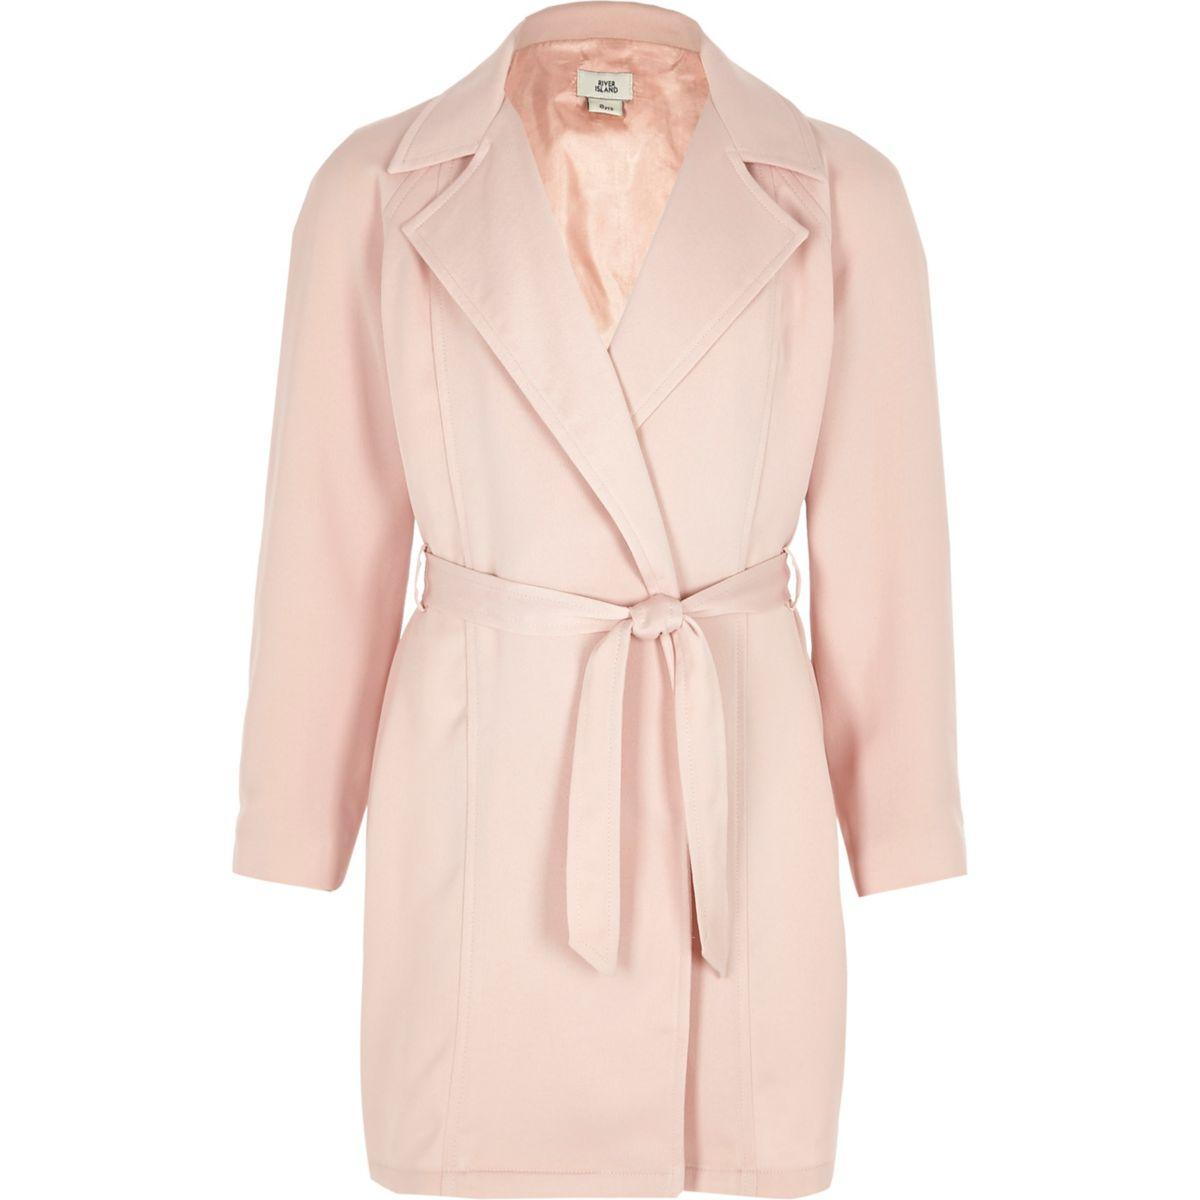 Girls pink long sleeve duster jacket